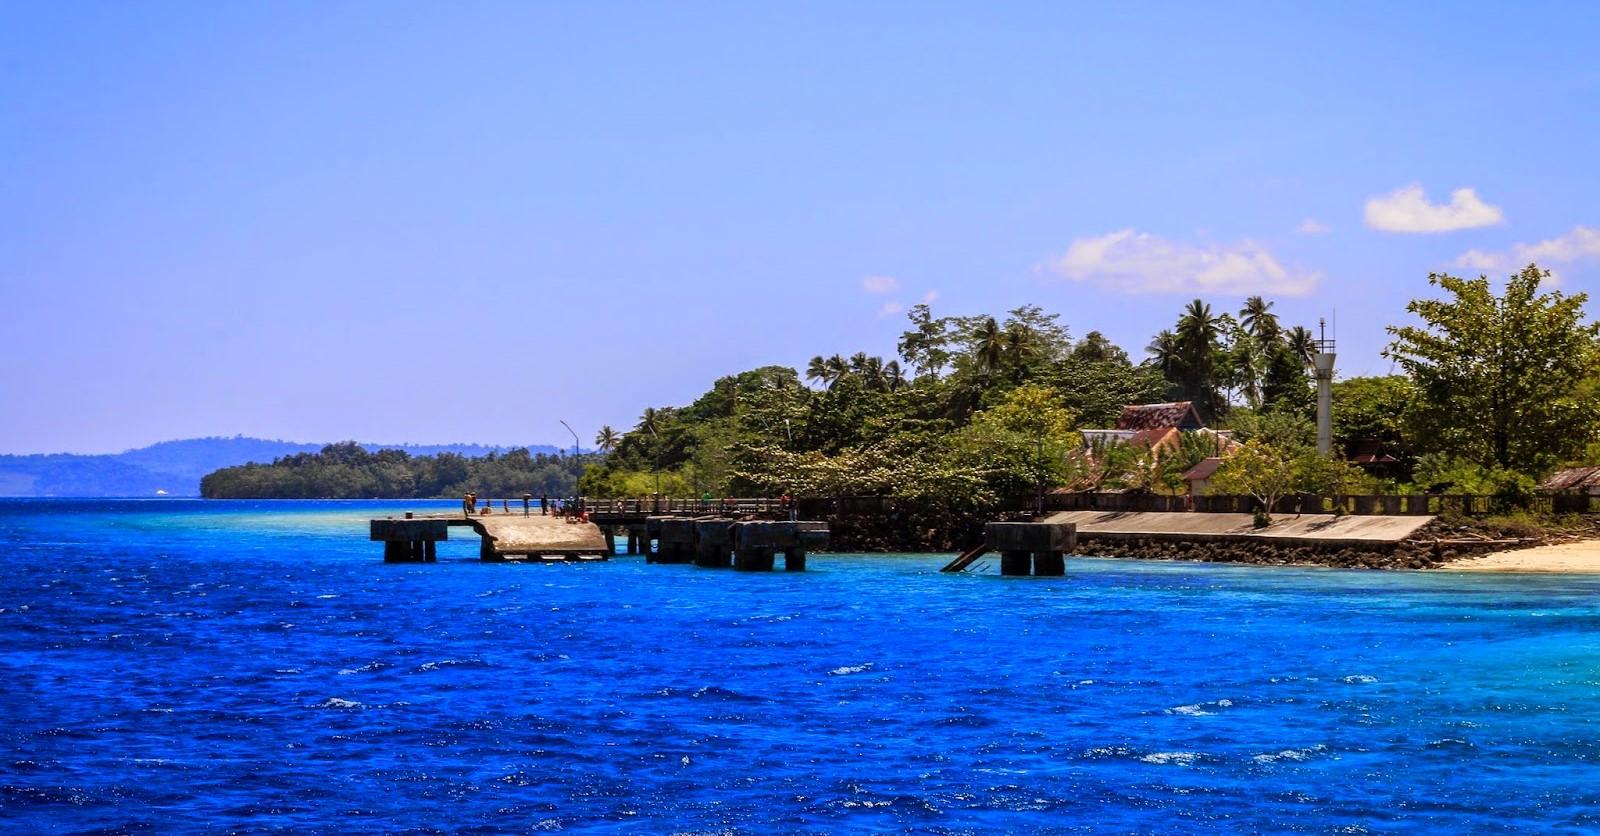 Pulau Saparua Jpg Memiliki Peninggalan Sejarah Salah Satunya Pantai Waisisil